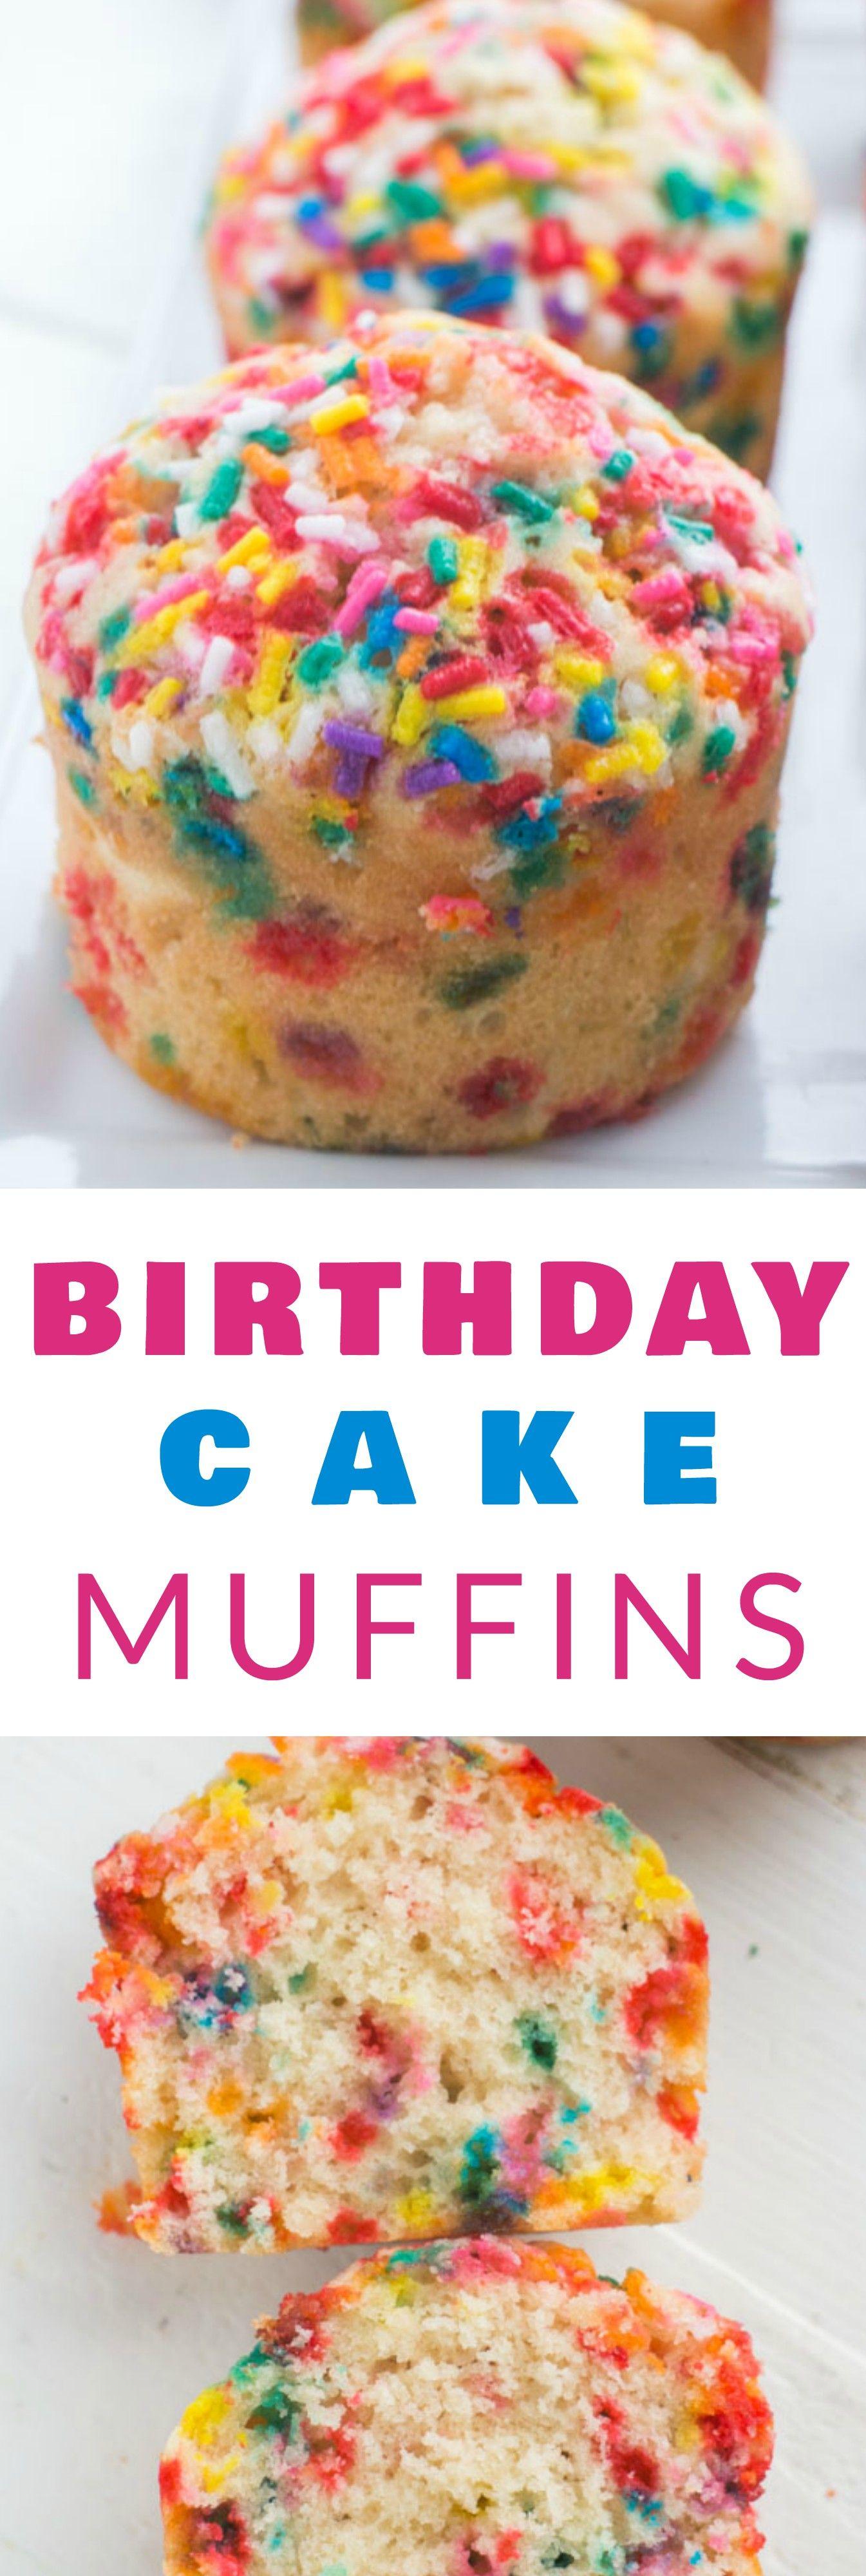 13 desserts Birthday awesome ideas